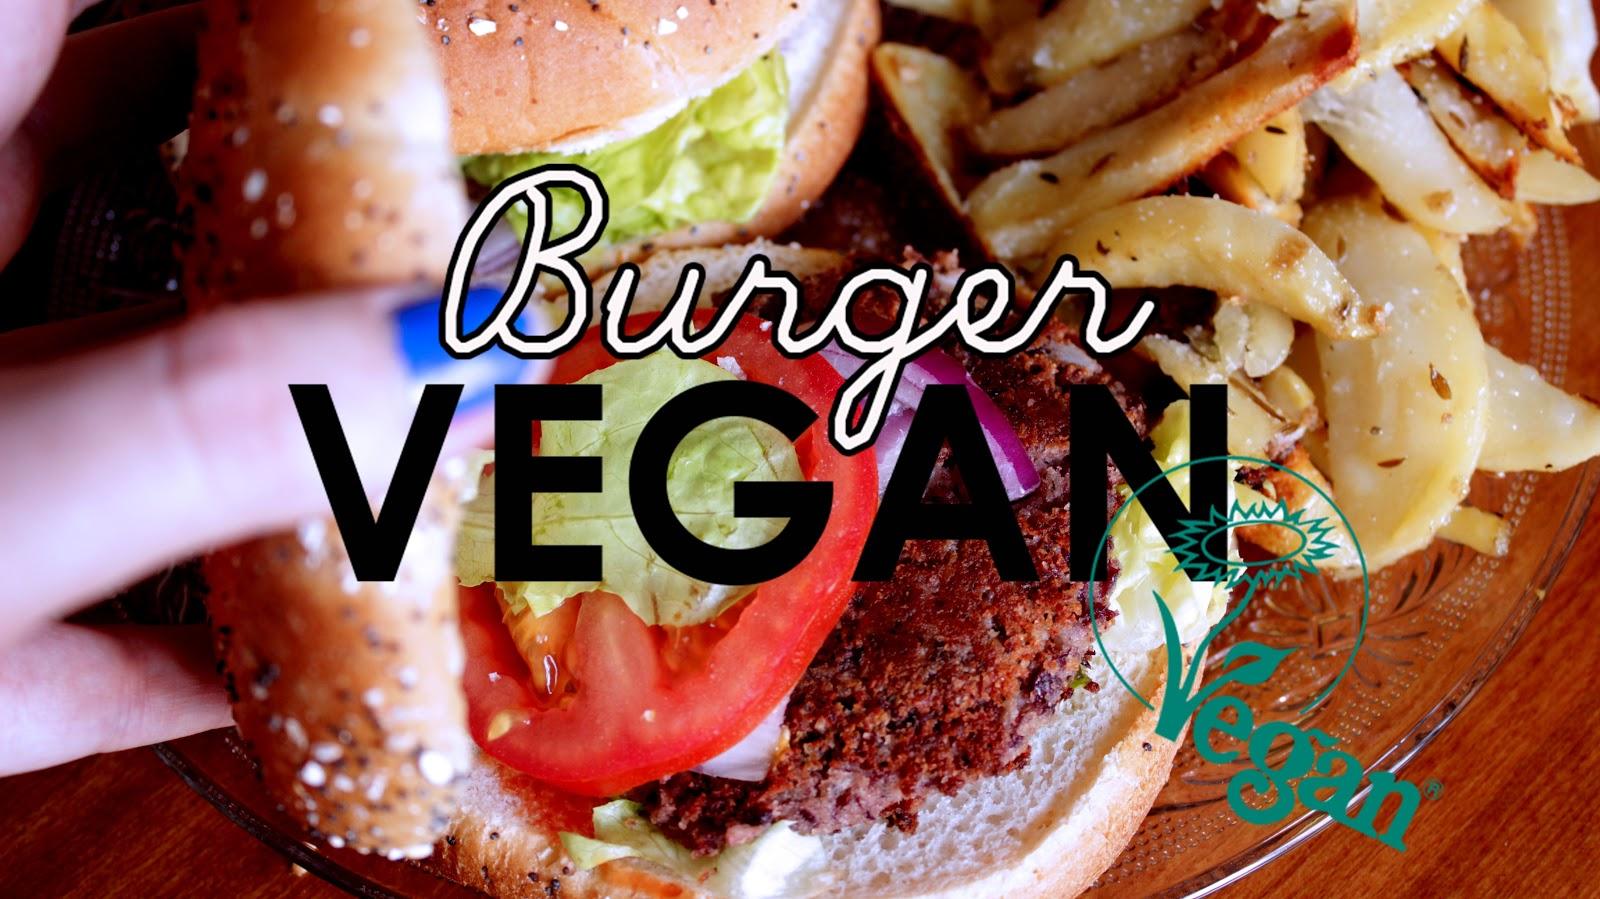 Recette de Burger Vegan